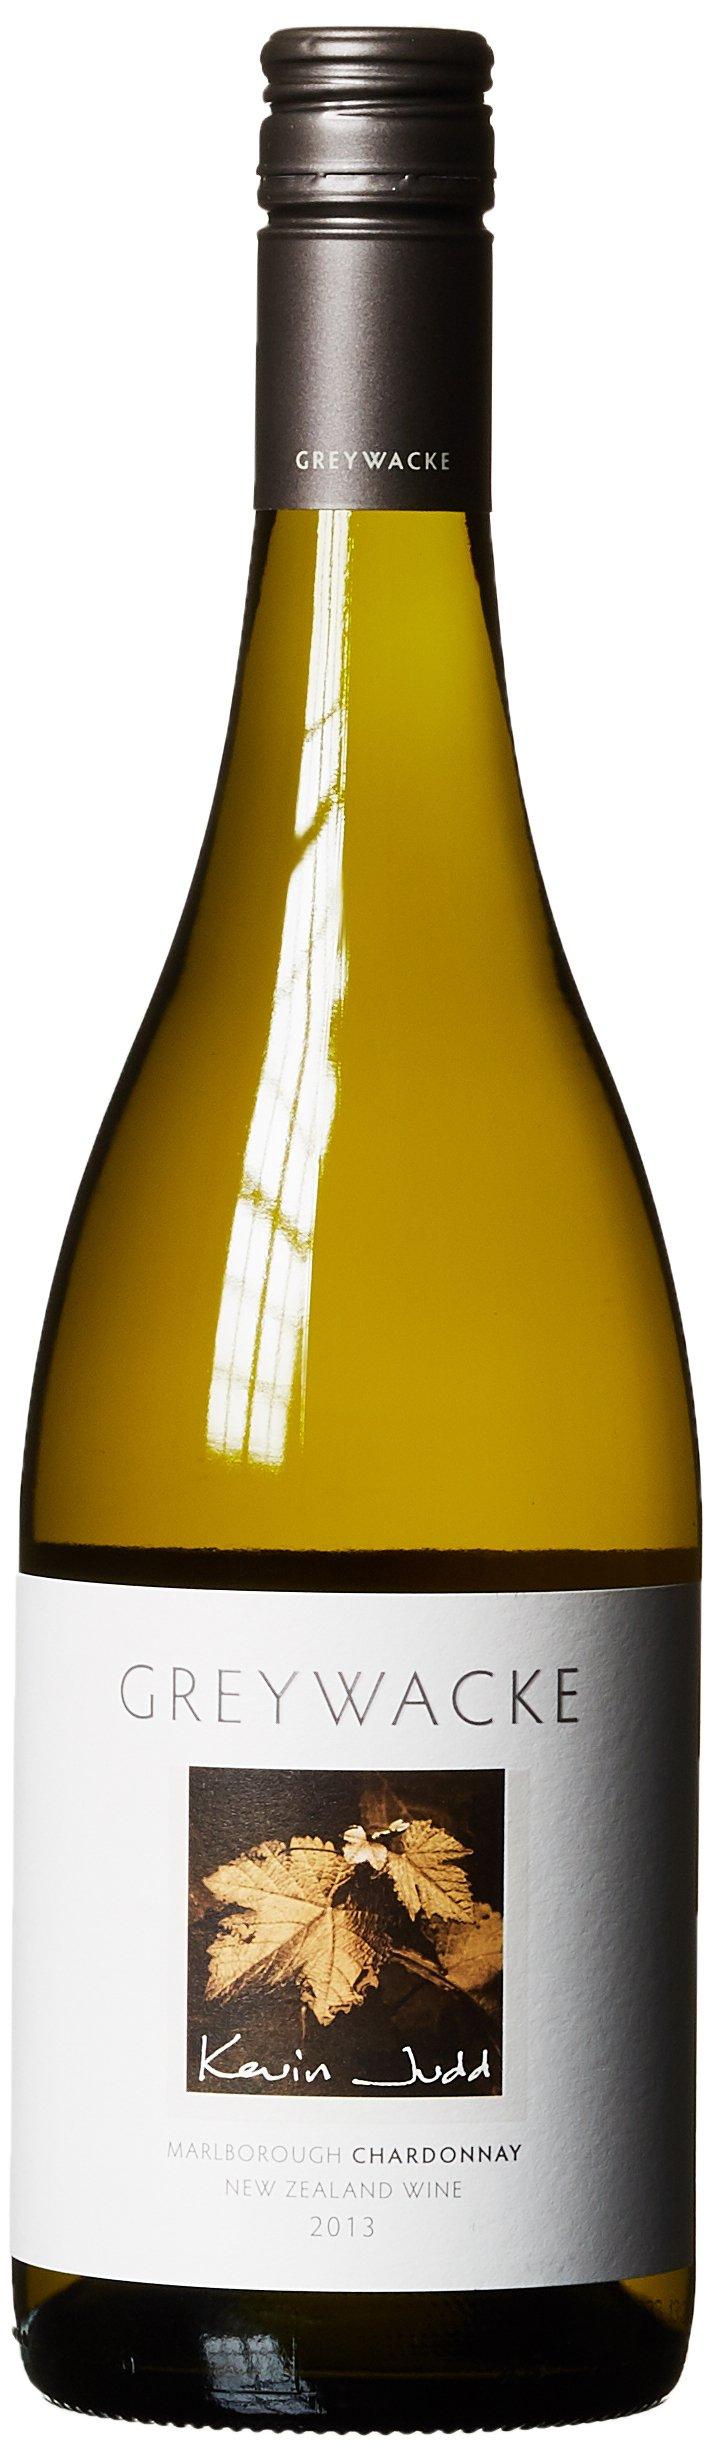 Greywacke-Chardonnay-2012-trocken-1-x-075-l